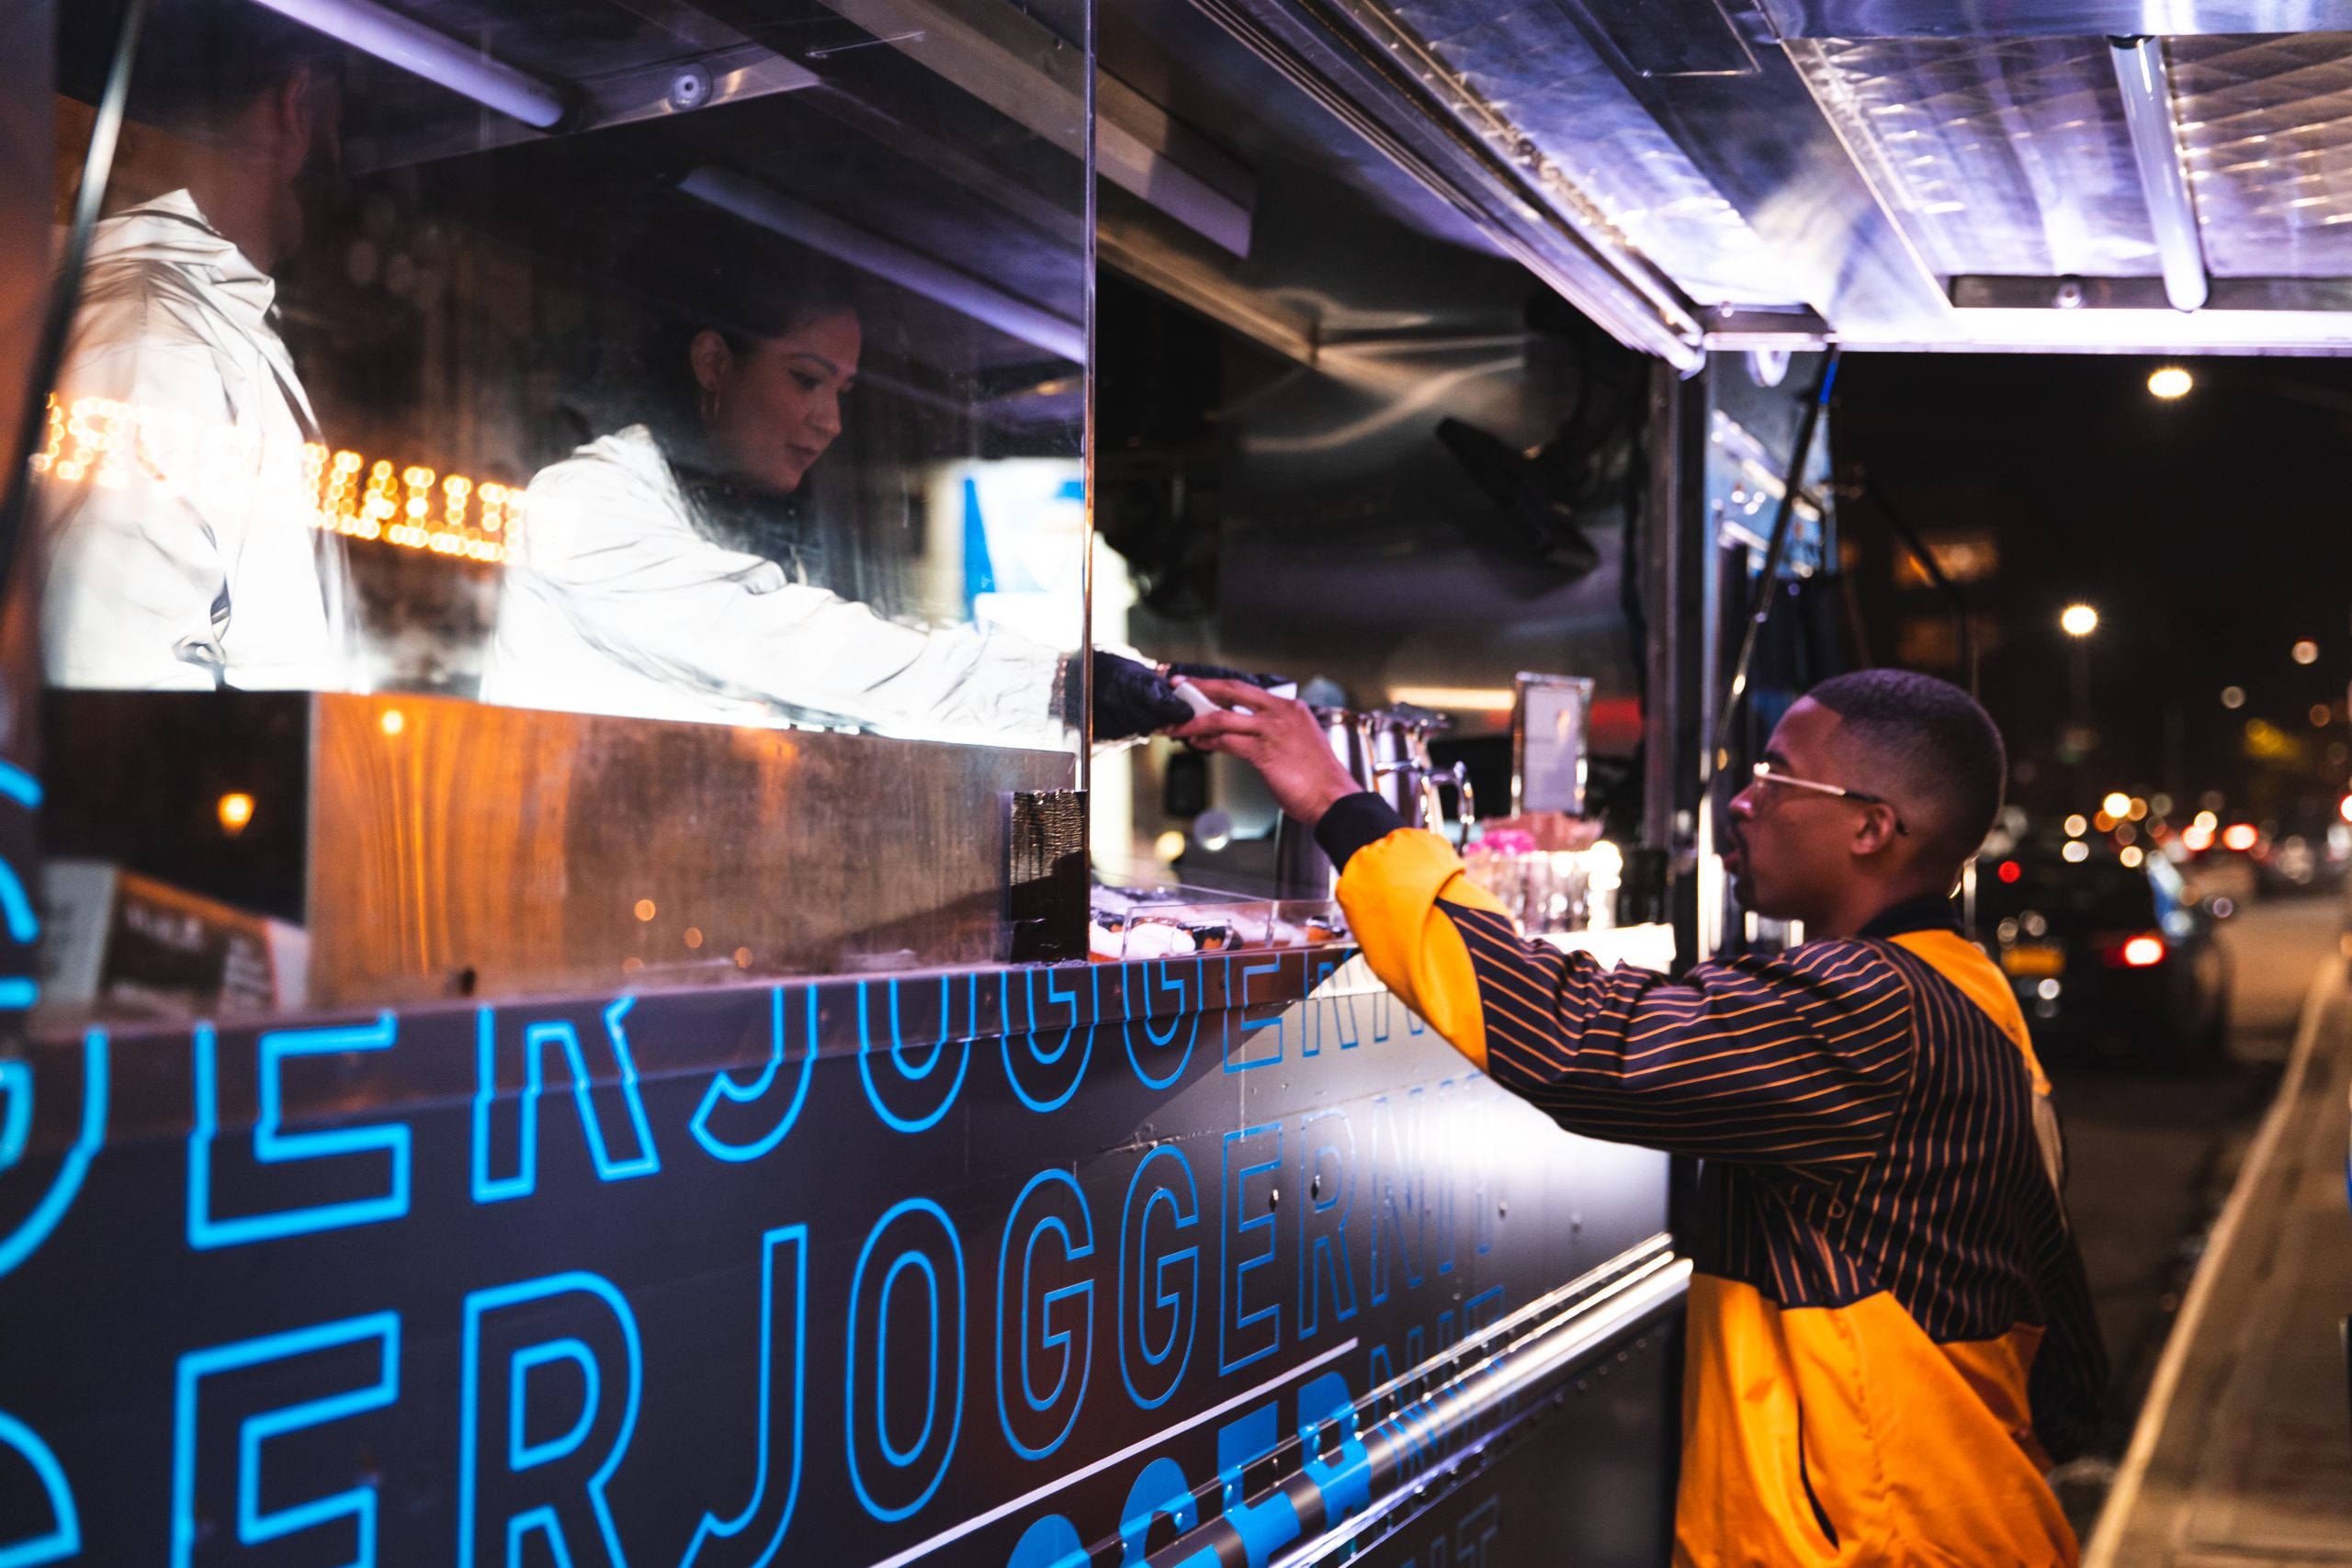 Adidas branded food truck